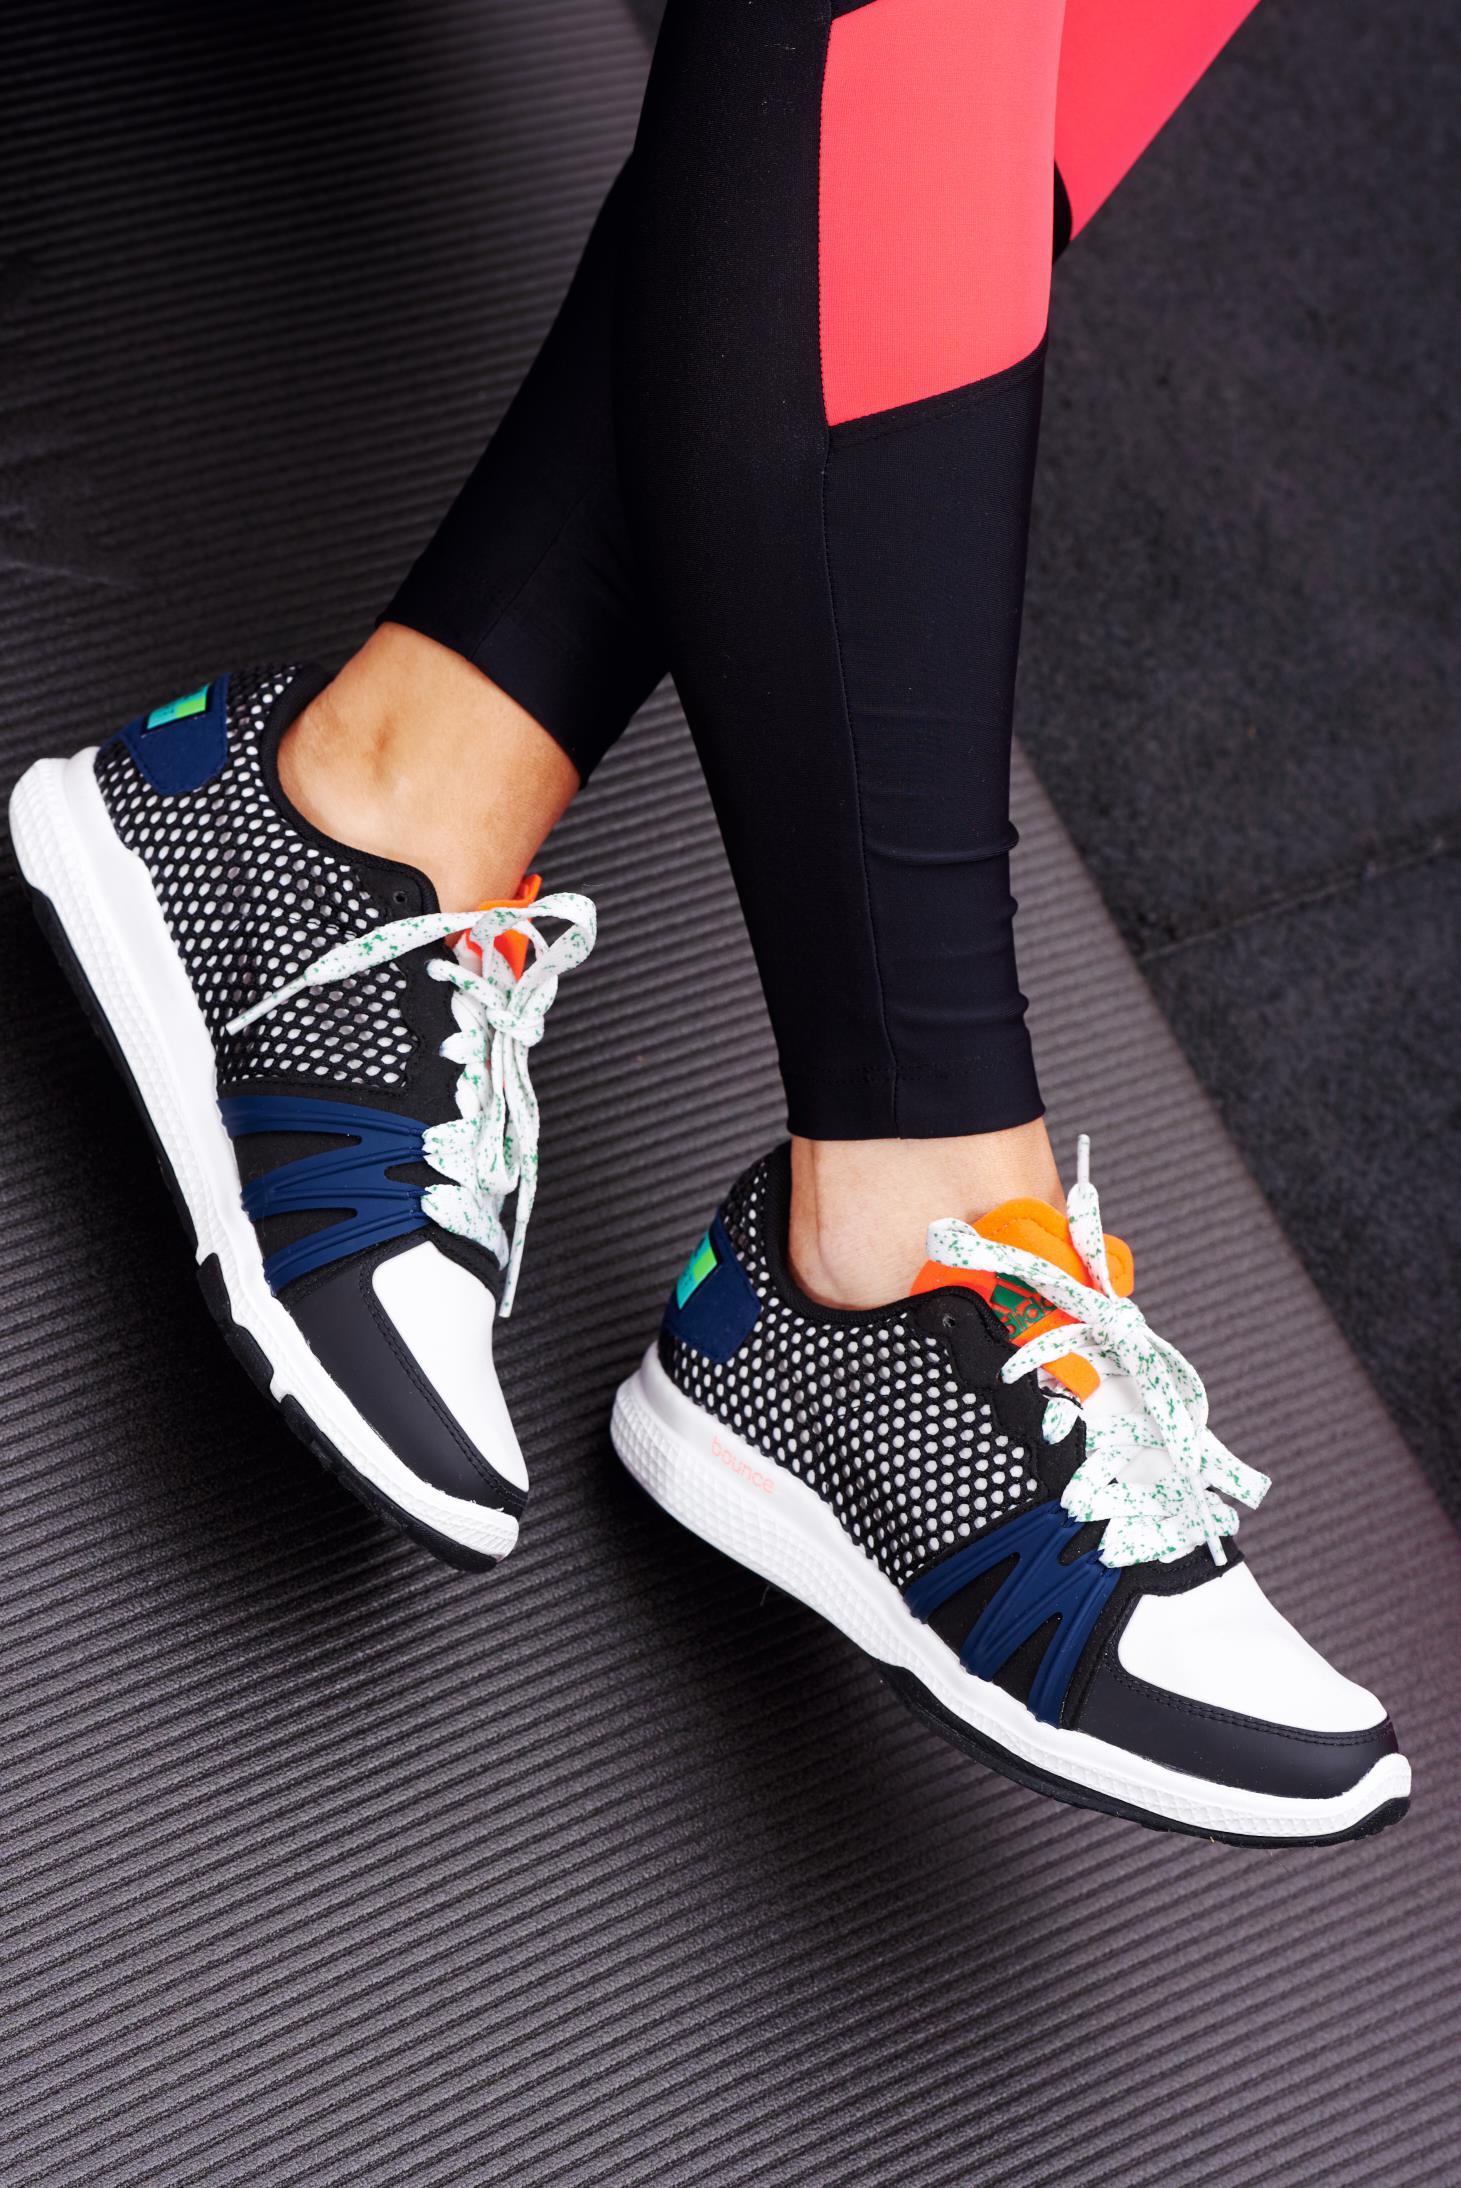 adidas stellasport shoes cheap online